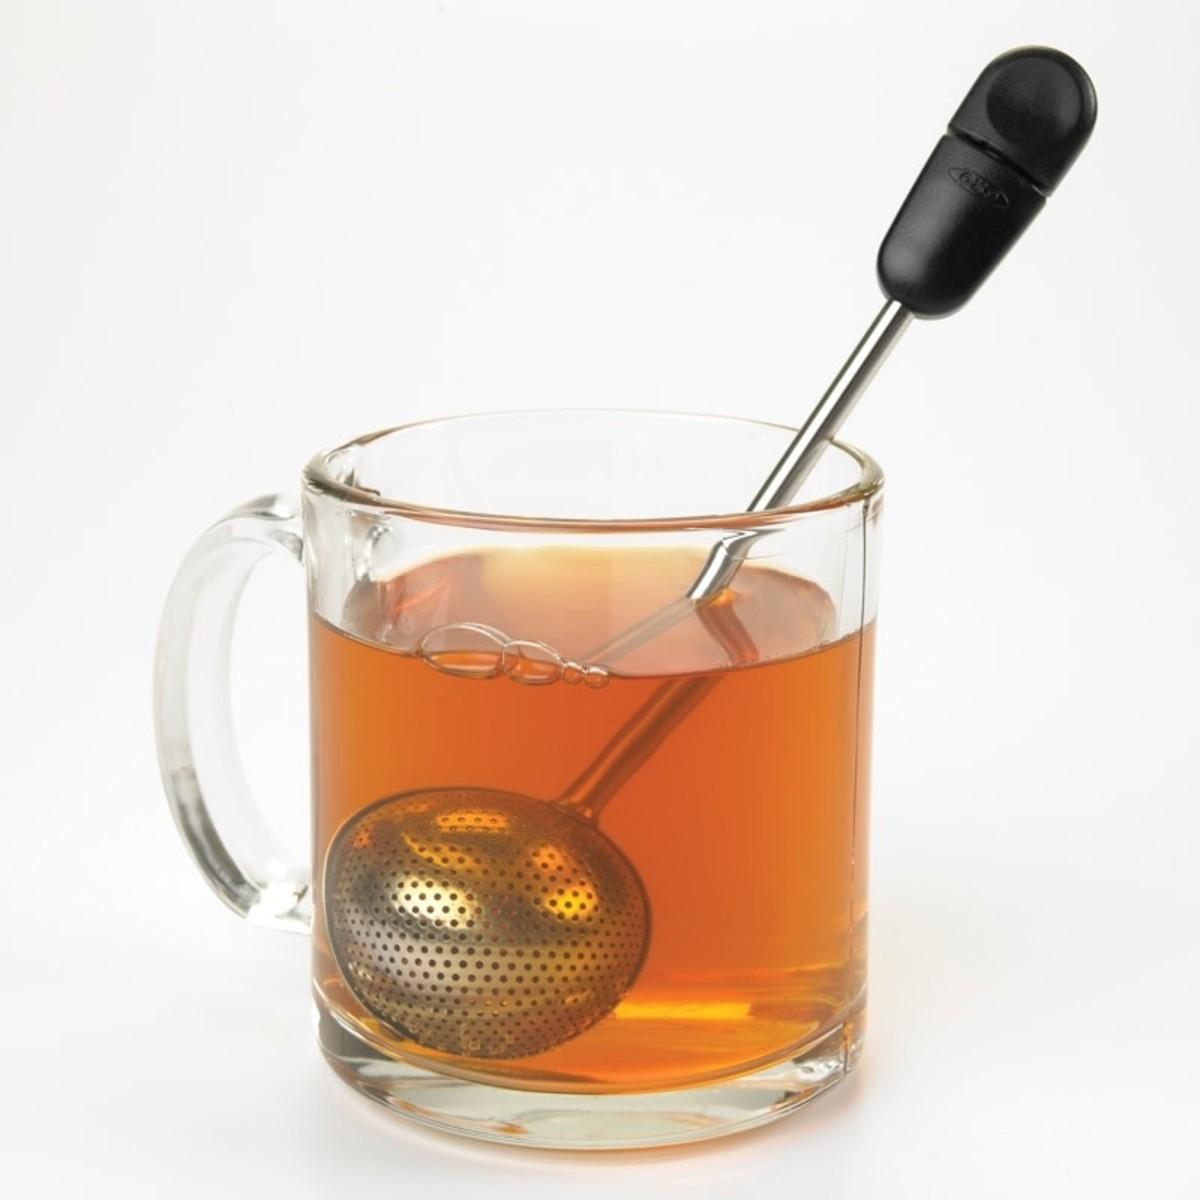 OXO Good Grips OXO Good Grips Twisting Tea Ball